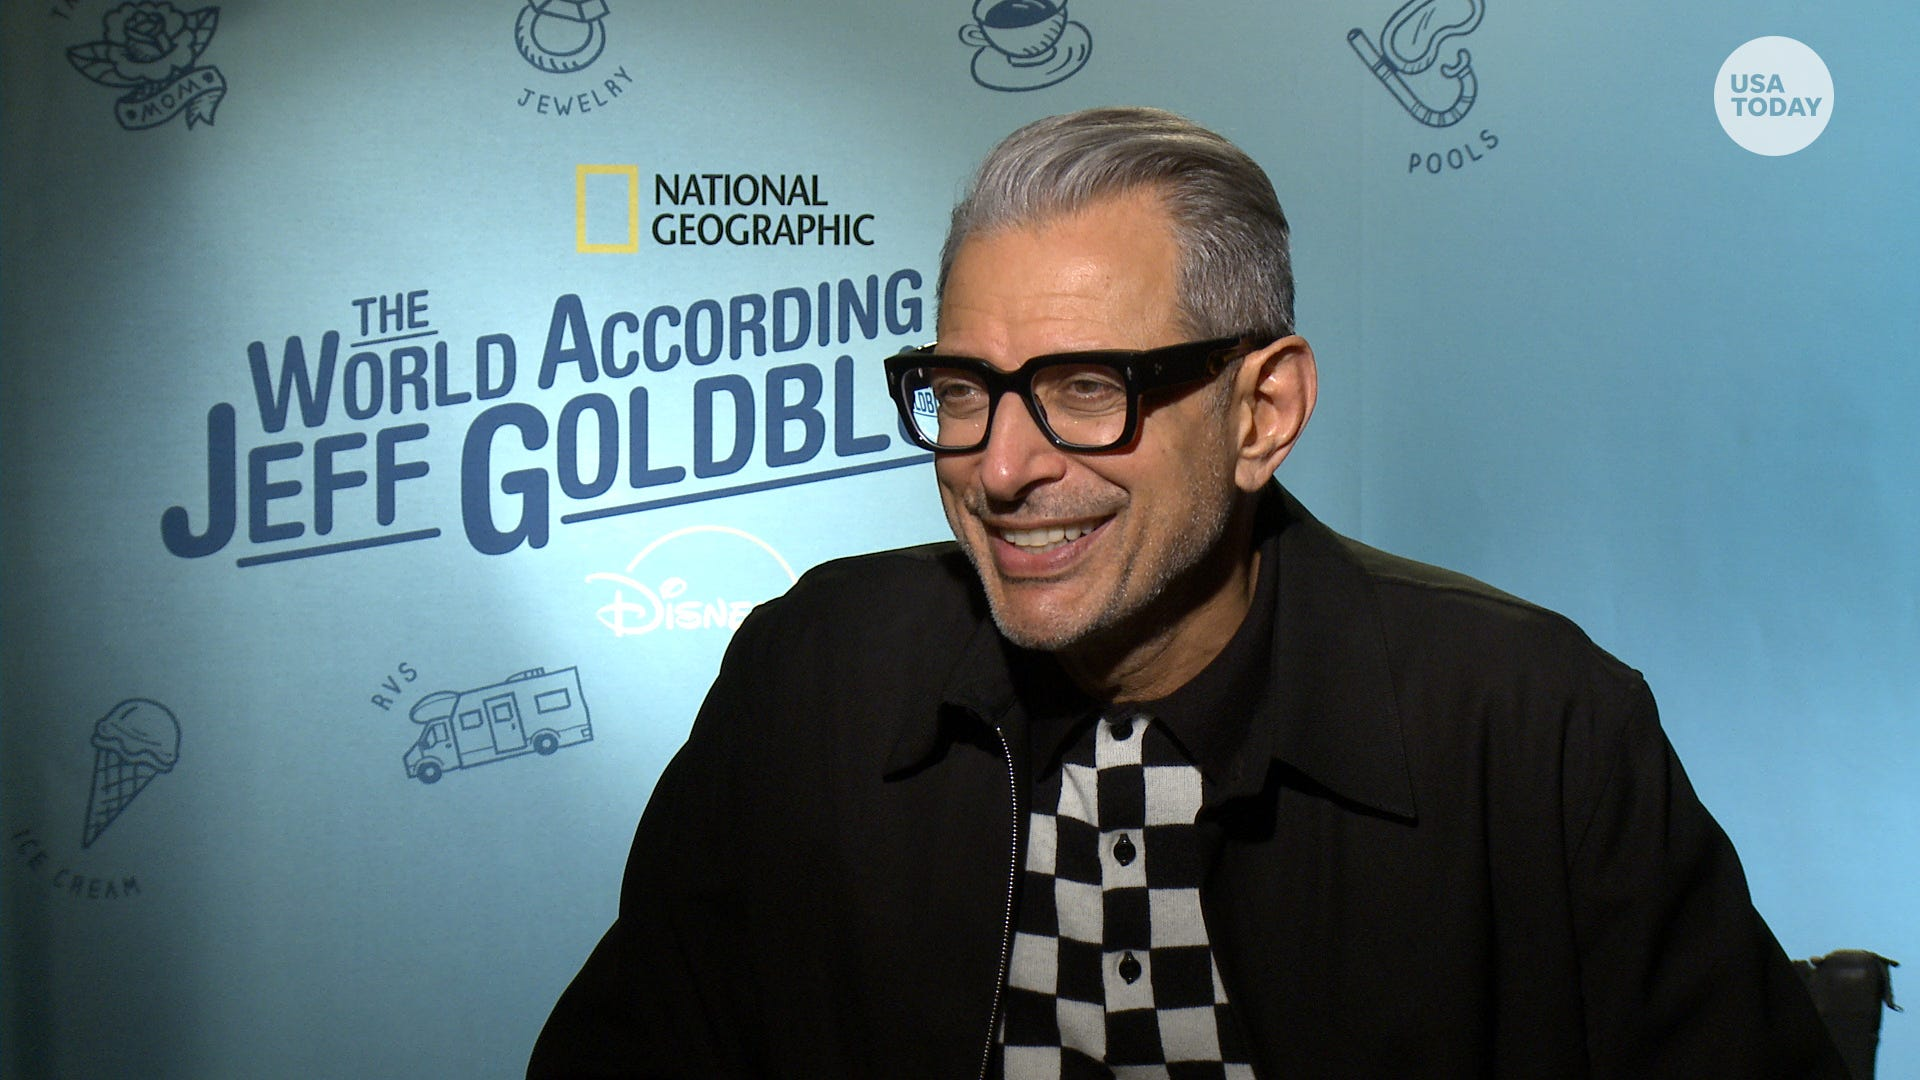 Jeff Goldblum criticized on Twitter for 'dangerous' comments on Islam